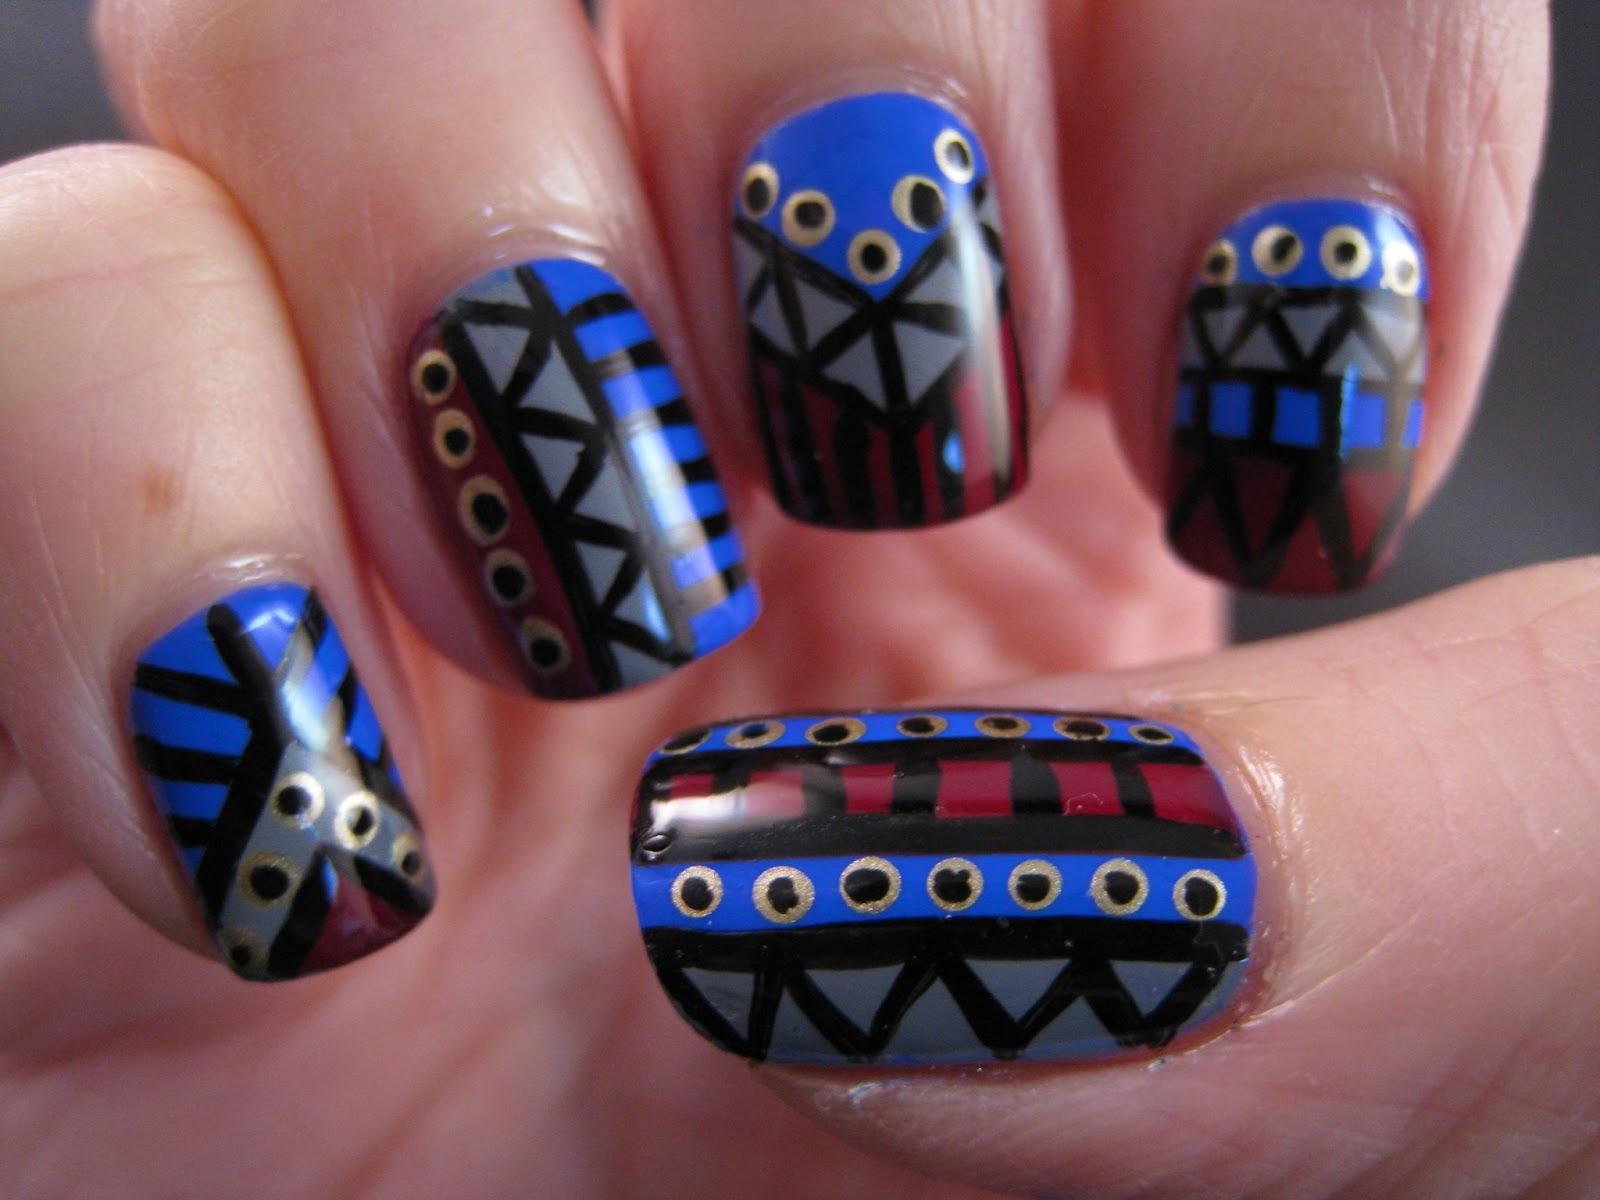 Nail art done at homeartnailsart summer glimpse beautiful summer red white and blue nail designs nail art lfc nail art prinsesfo Image collections